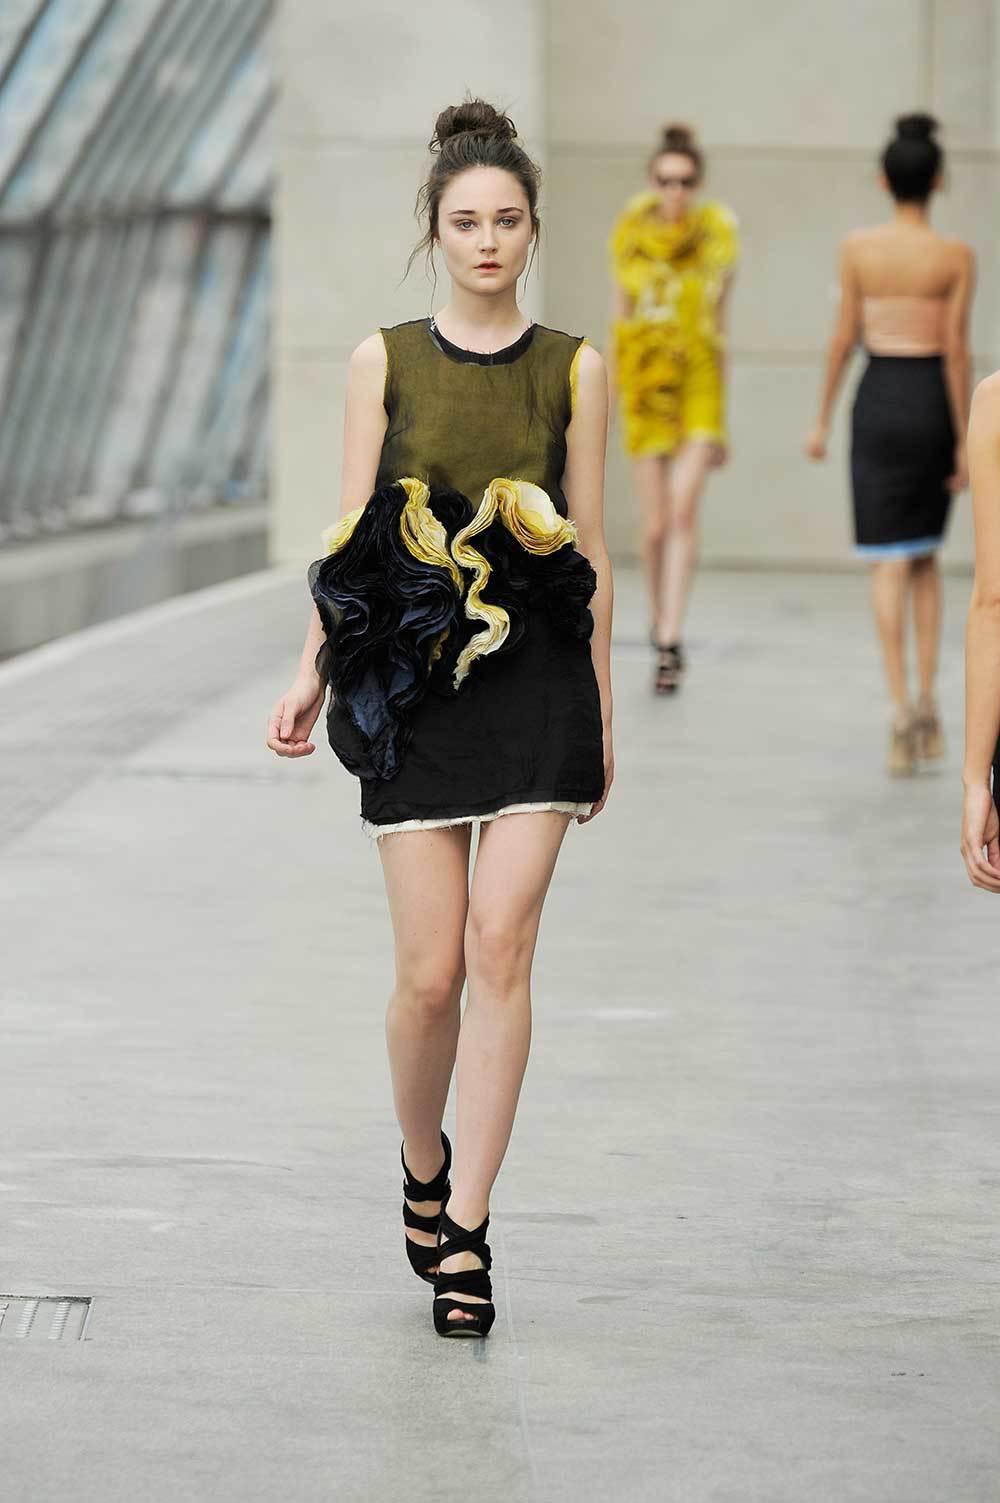 Felicity-Brown-SS11-09-Mustard-Silk-Layered-Tee-&-Ruffle-Skirt.jpg